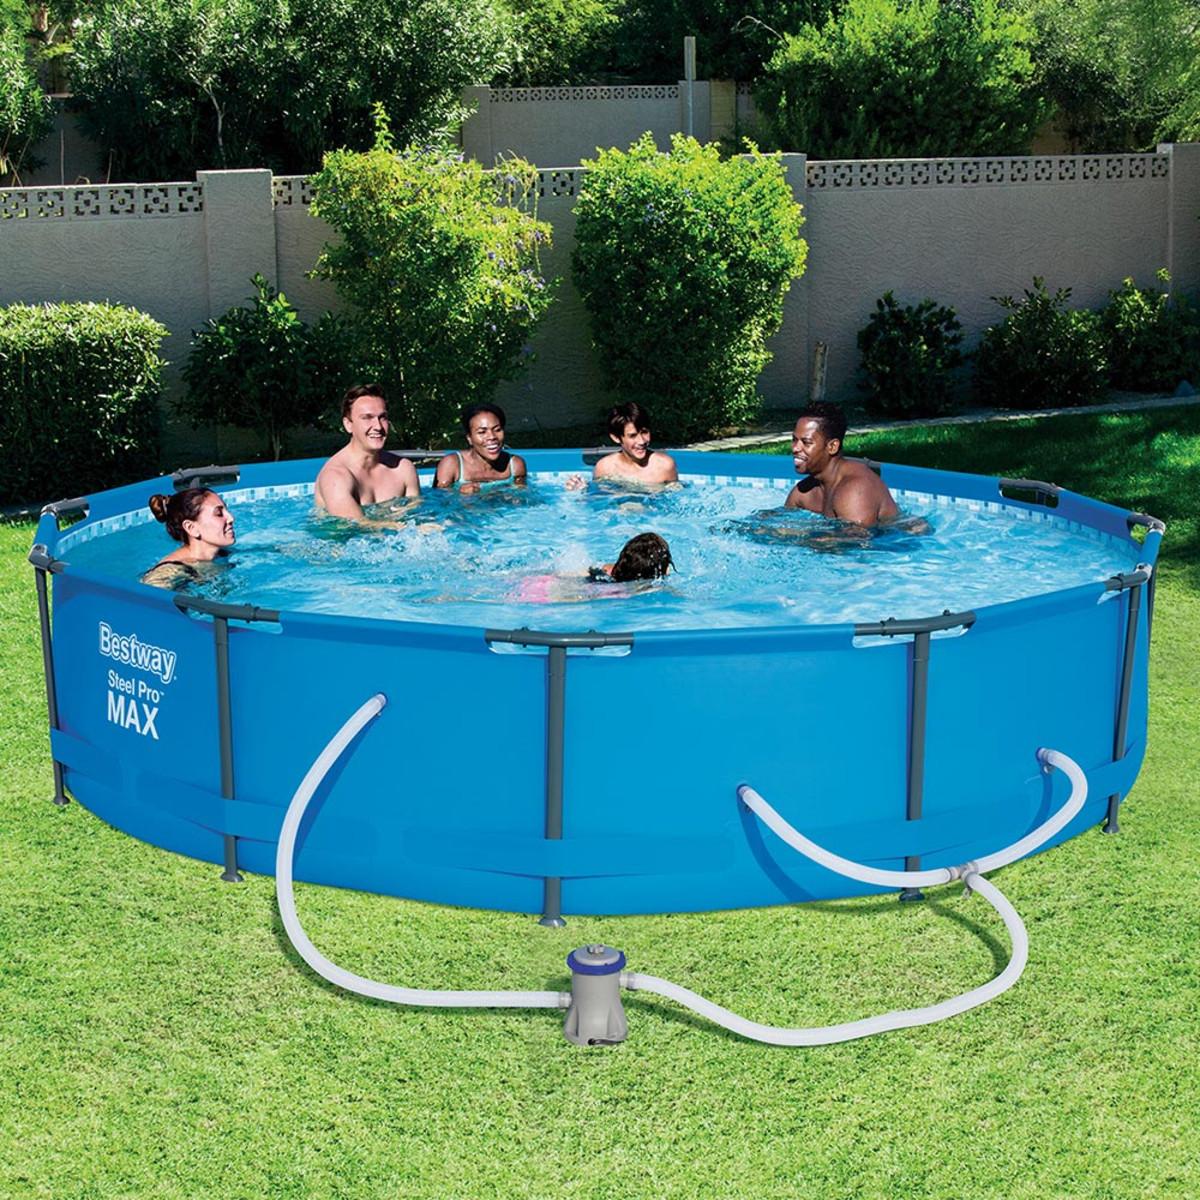 Bestway 12 X 30 Quot Steel Pro Pool Set Splash Super Center